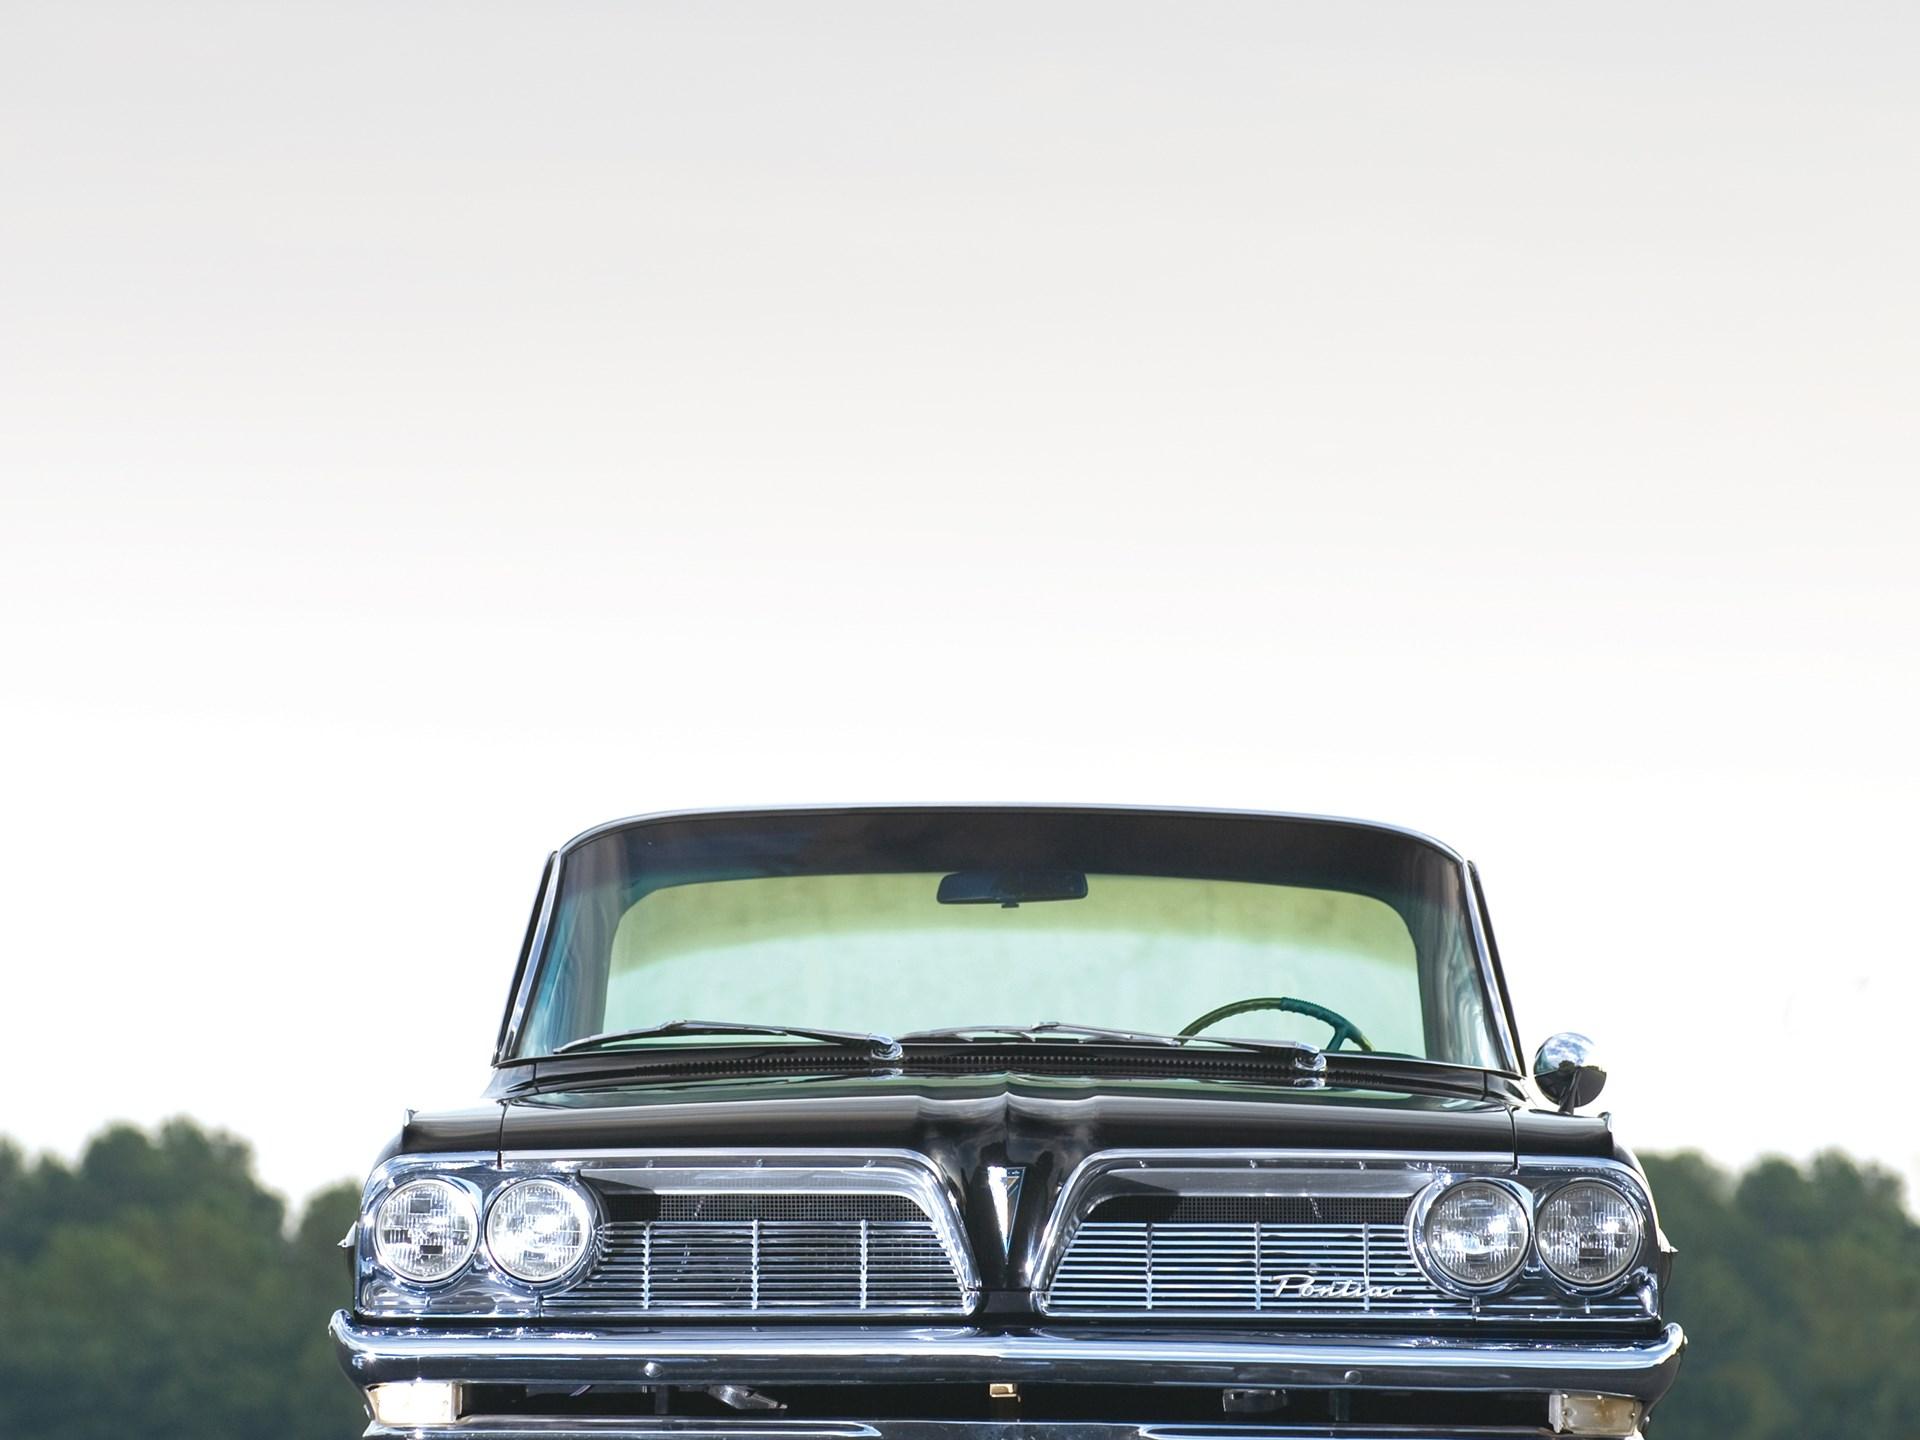 Rm Sothebys 1961 Pontiac Ventura Super Duty 421 Hardtop The